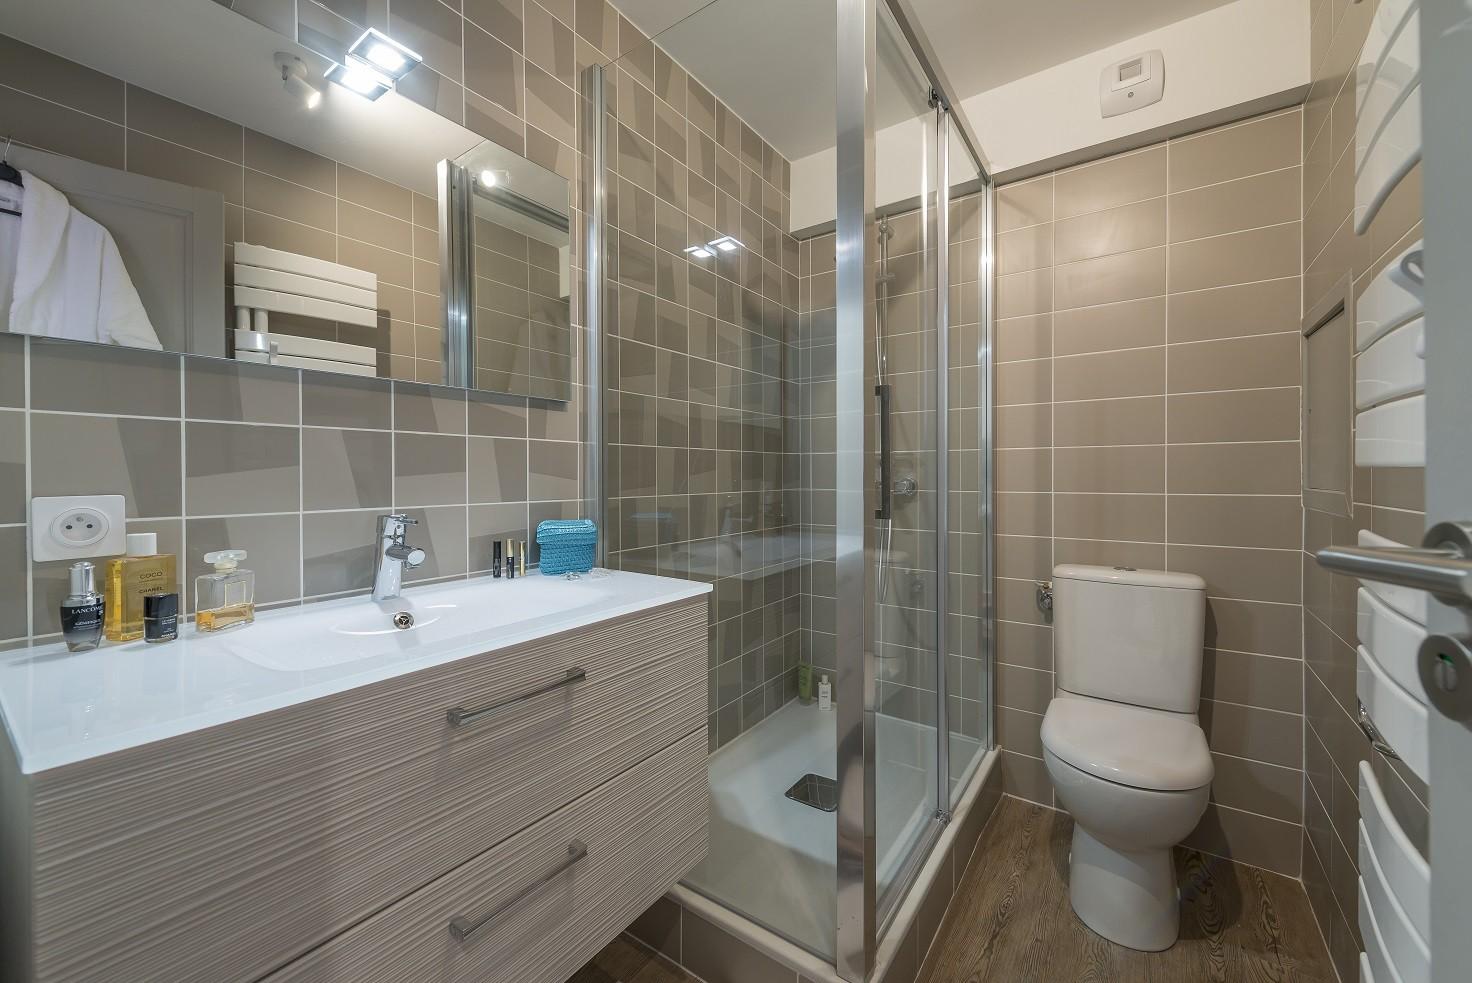 salle-de-bain-1472x983-7762